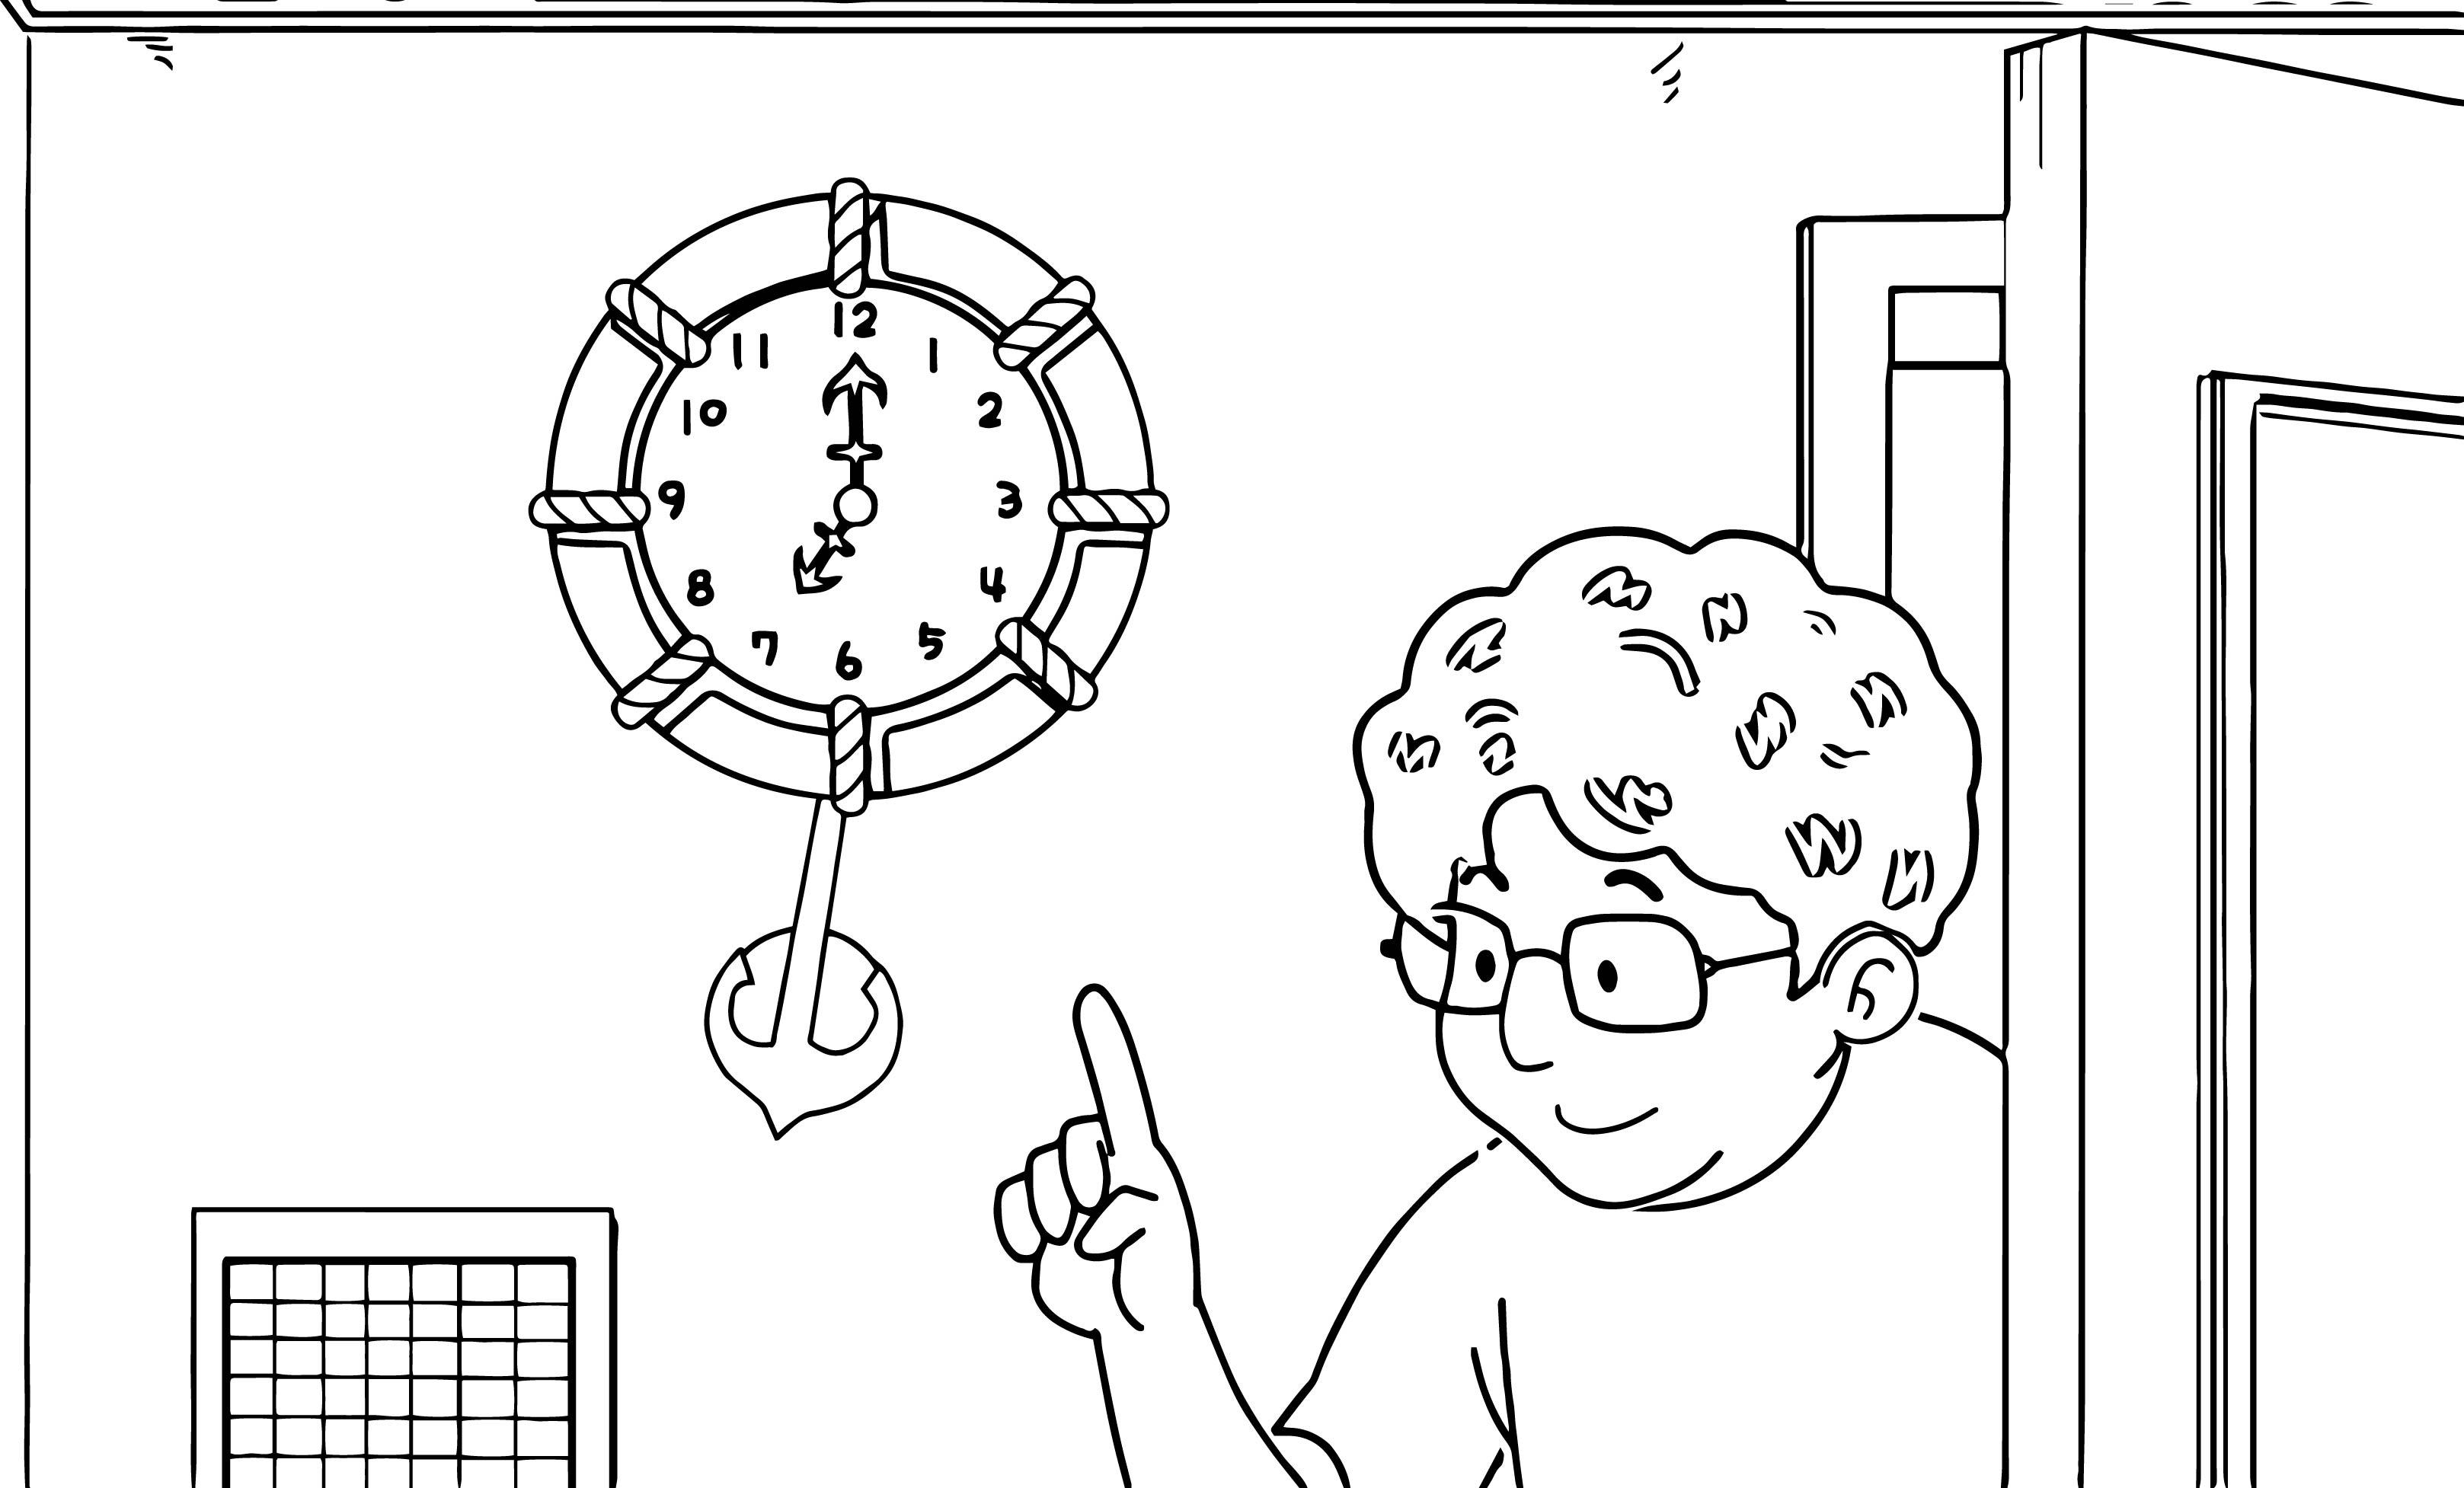 Speaking Cartoon Kids Coloring Page 36